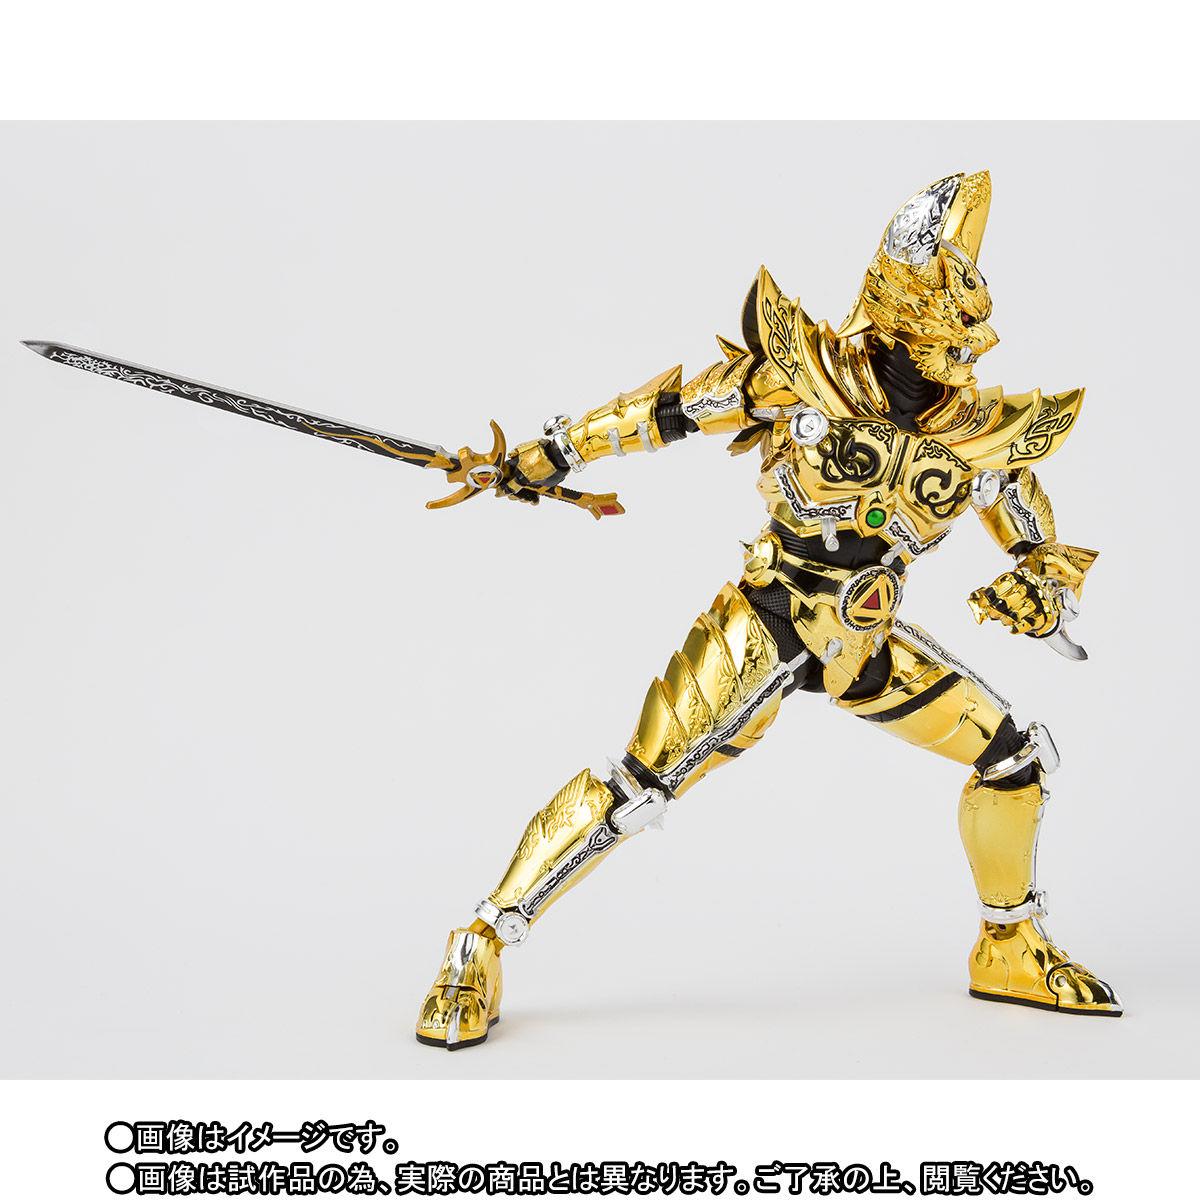 S.H.フィギュアーツ(真骨彫製法)『黄金騎士ガロ(冴島雷牙)』牙狼〈GARO〉可動フィギュア-006